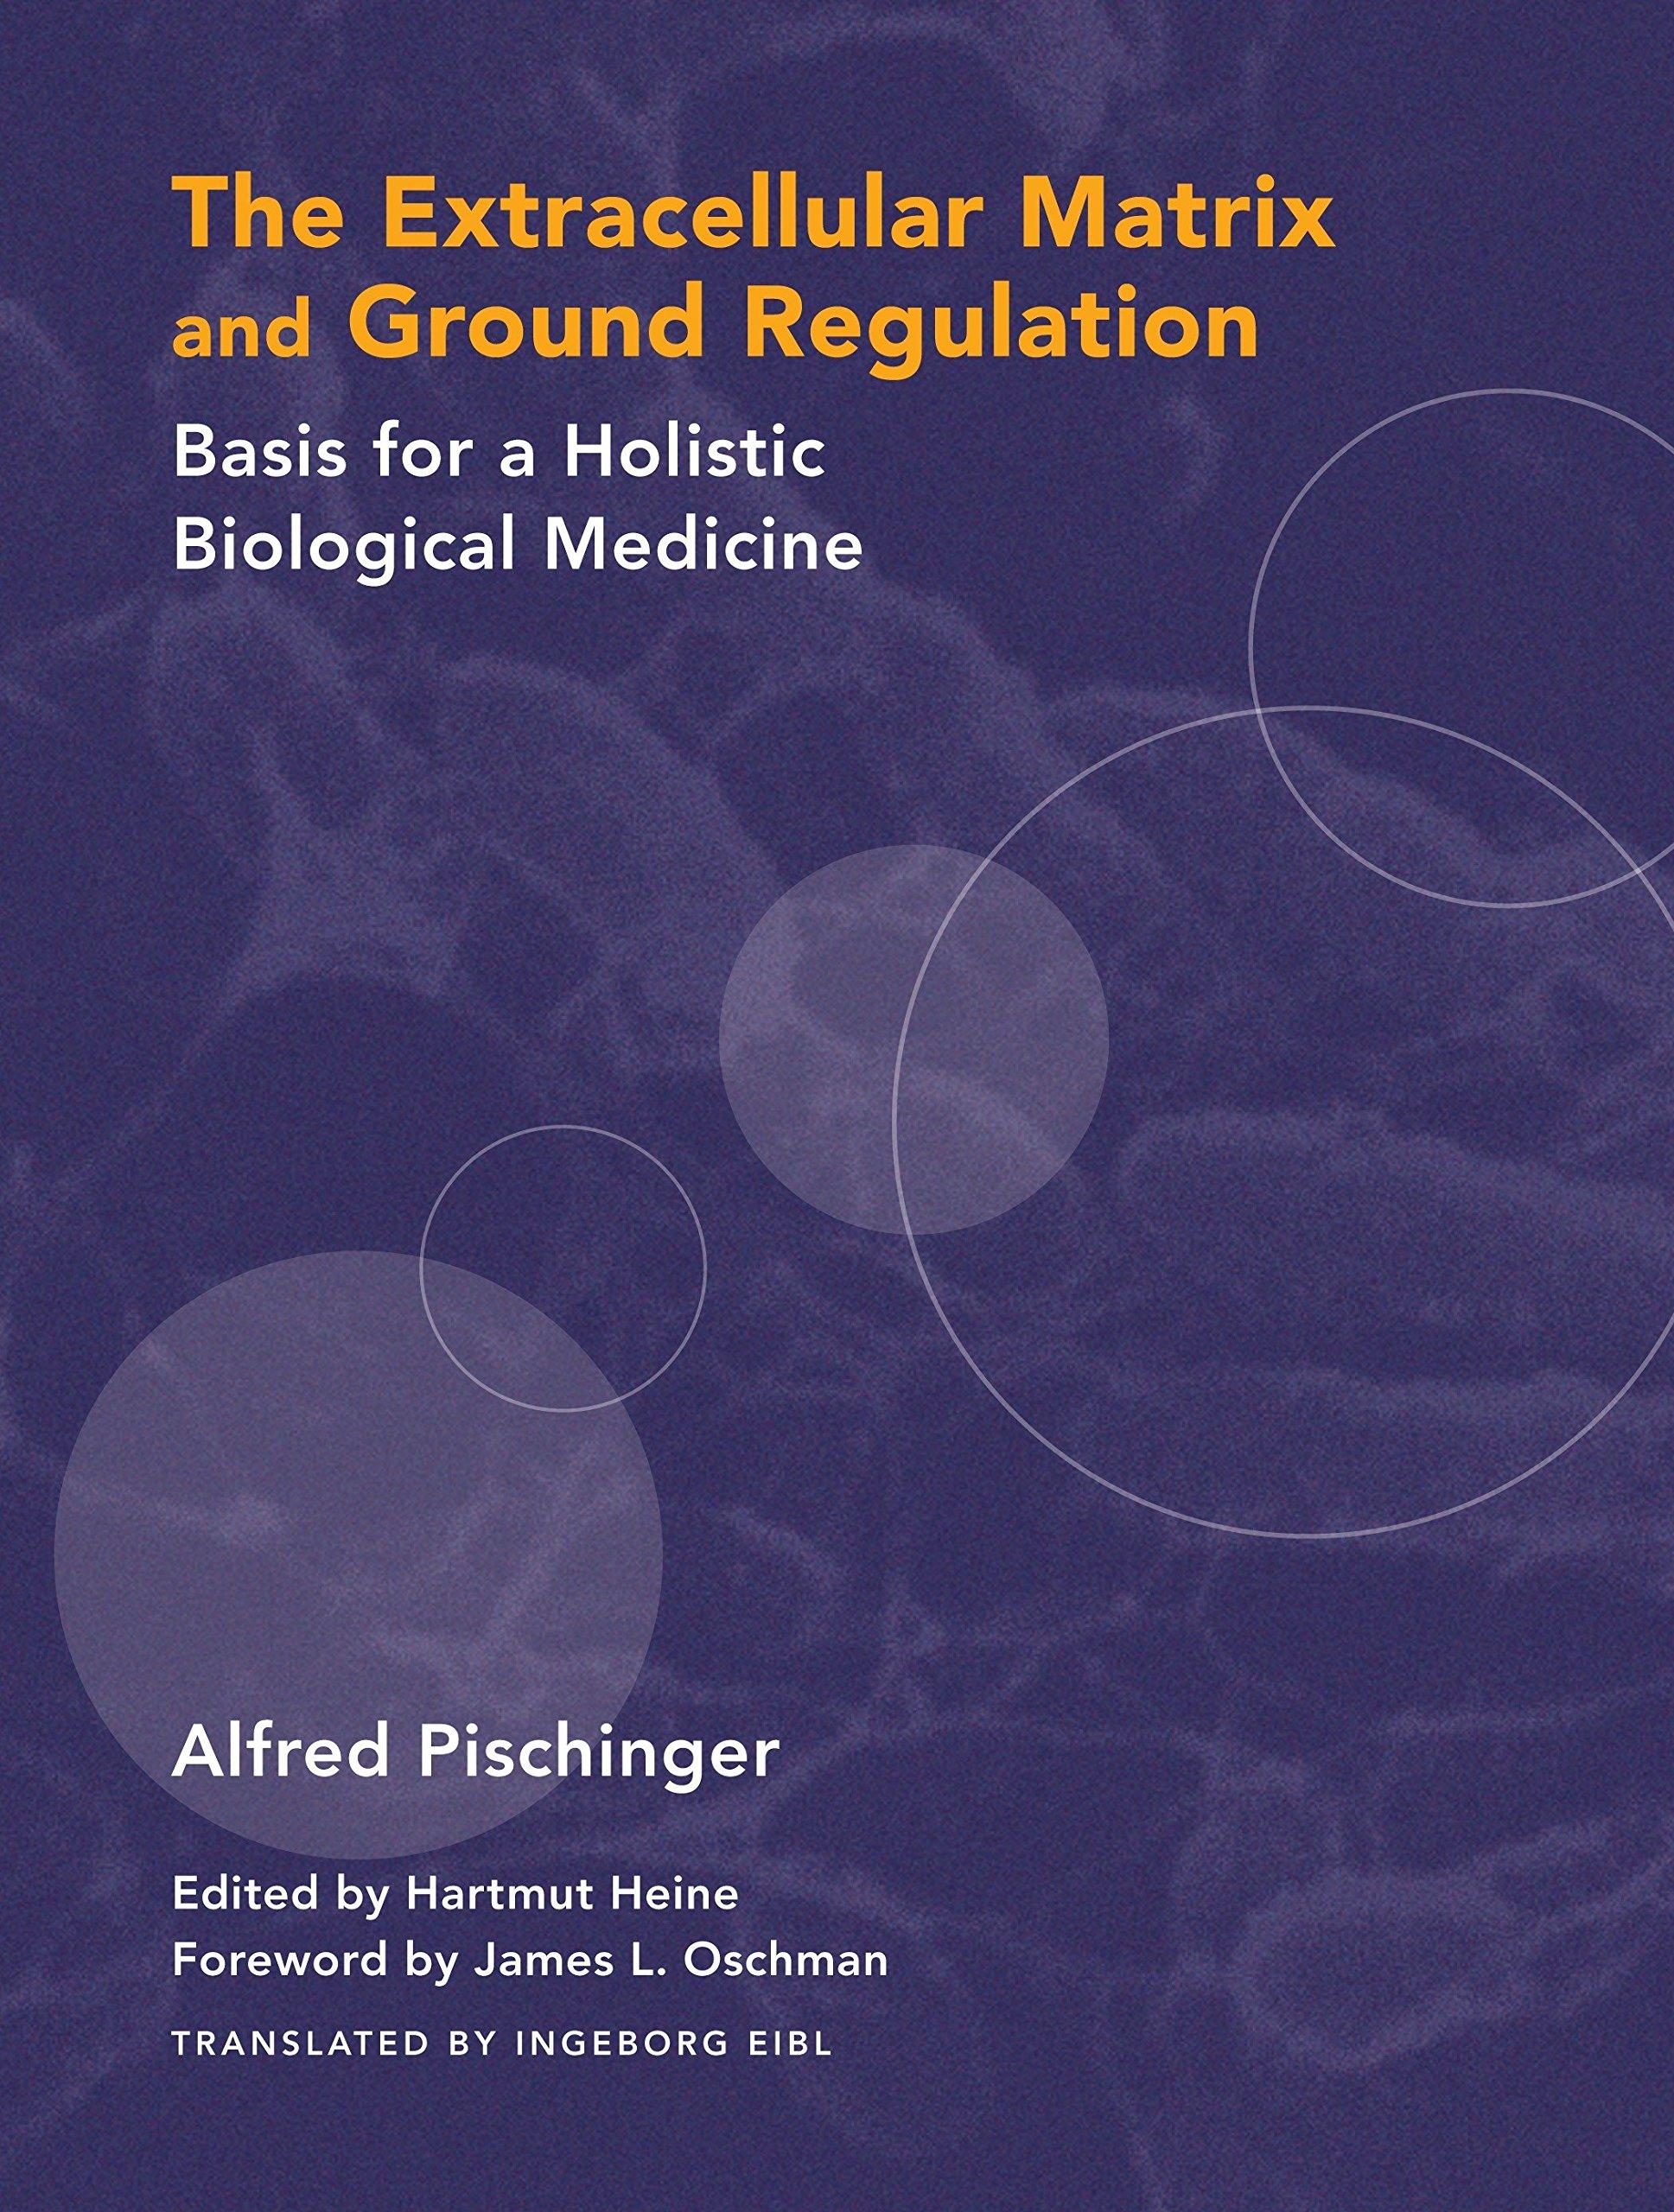 Download The Extracellular Matrix and Ground Regulation: Basis for a Holistic Biological Medicine pdf epub